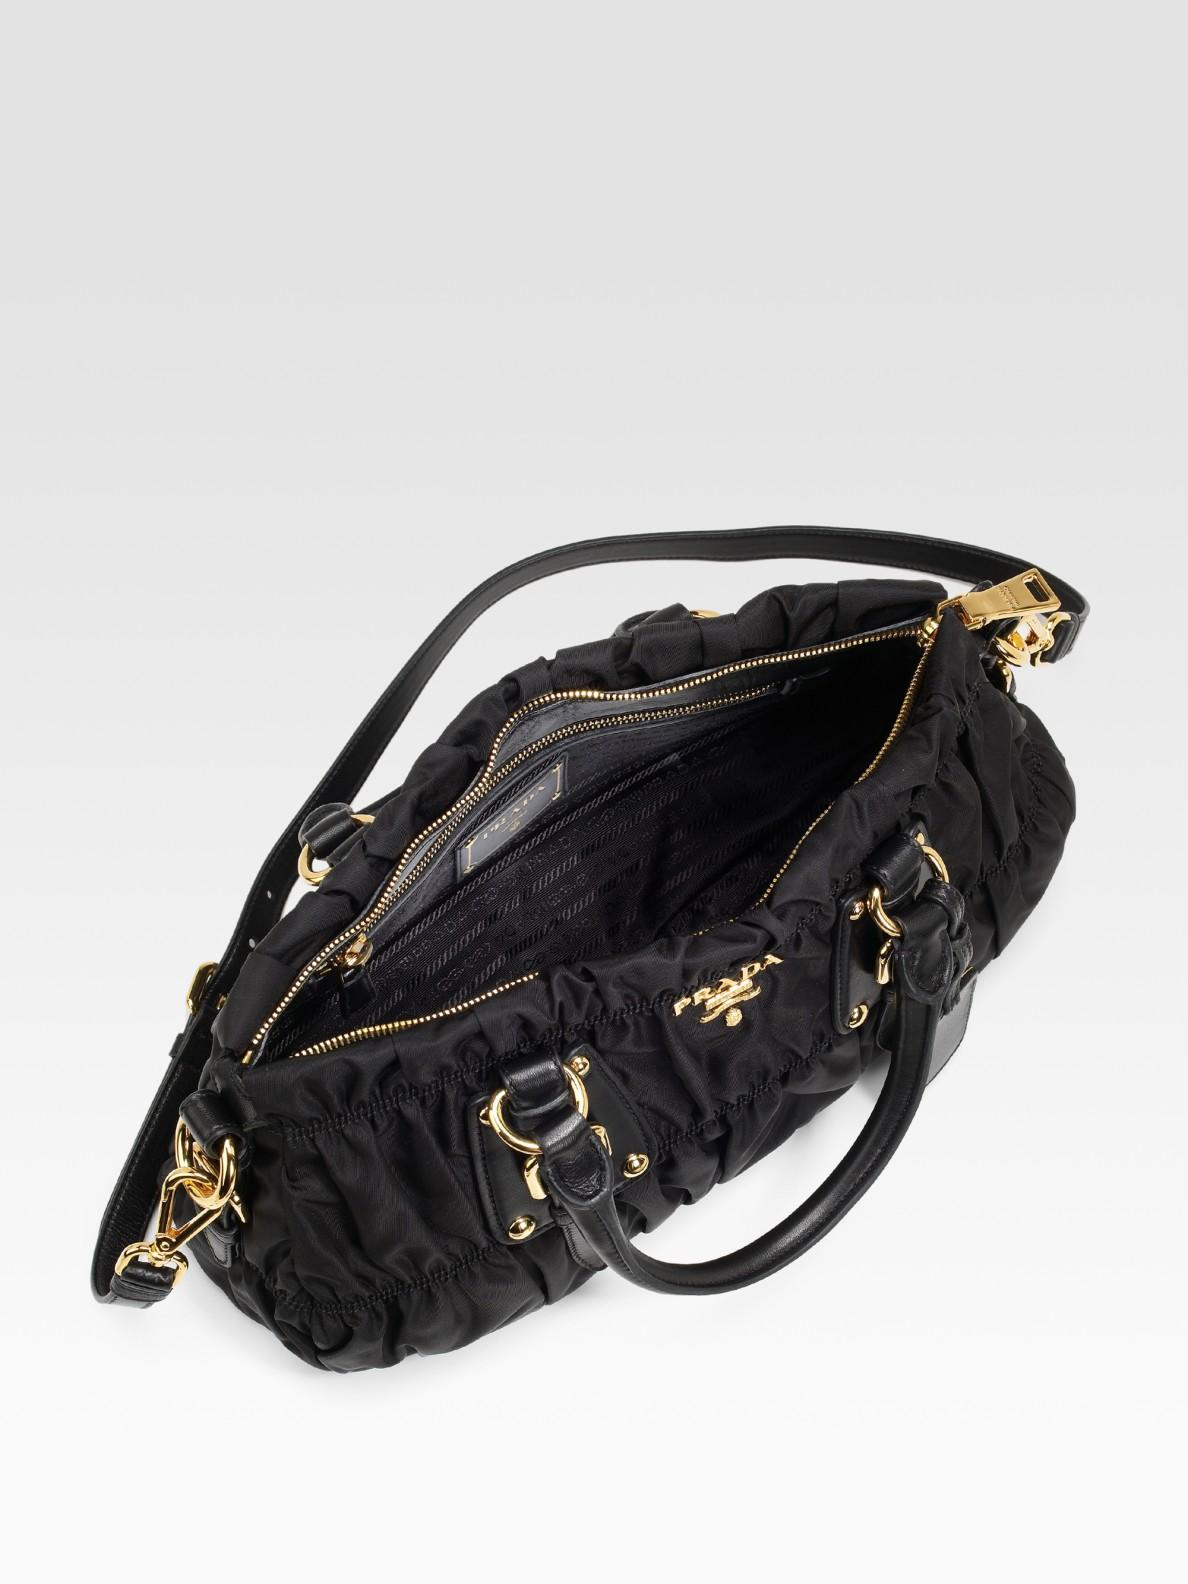 prada leather accessories - Prada Tessuto Gaufre Top Handle Bag in Black | Lyst